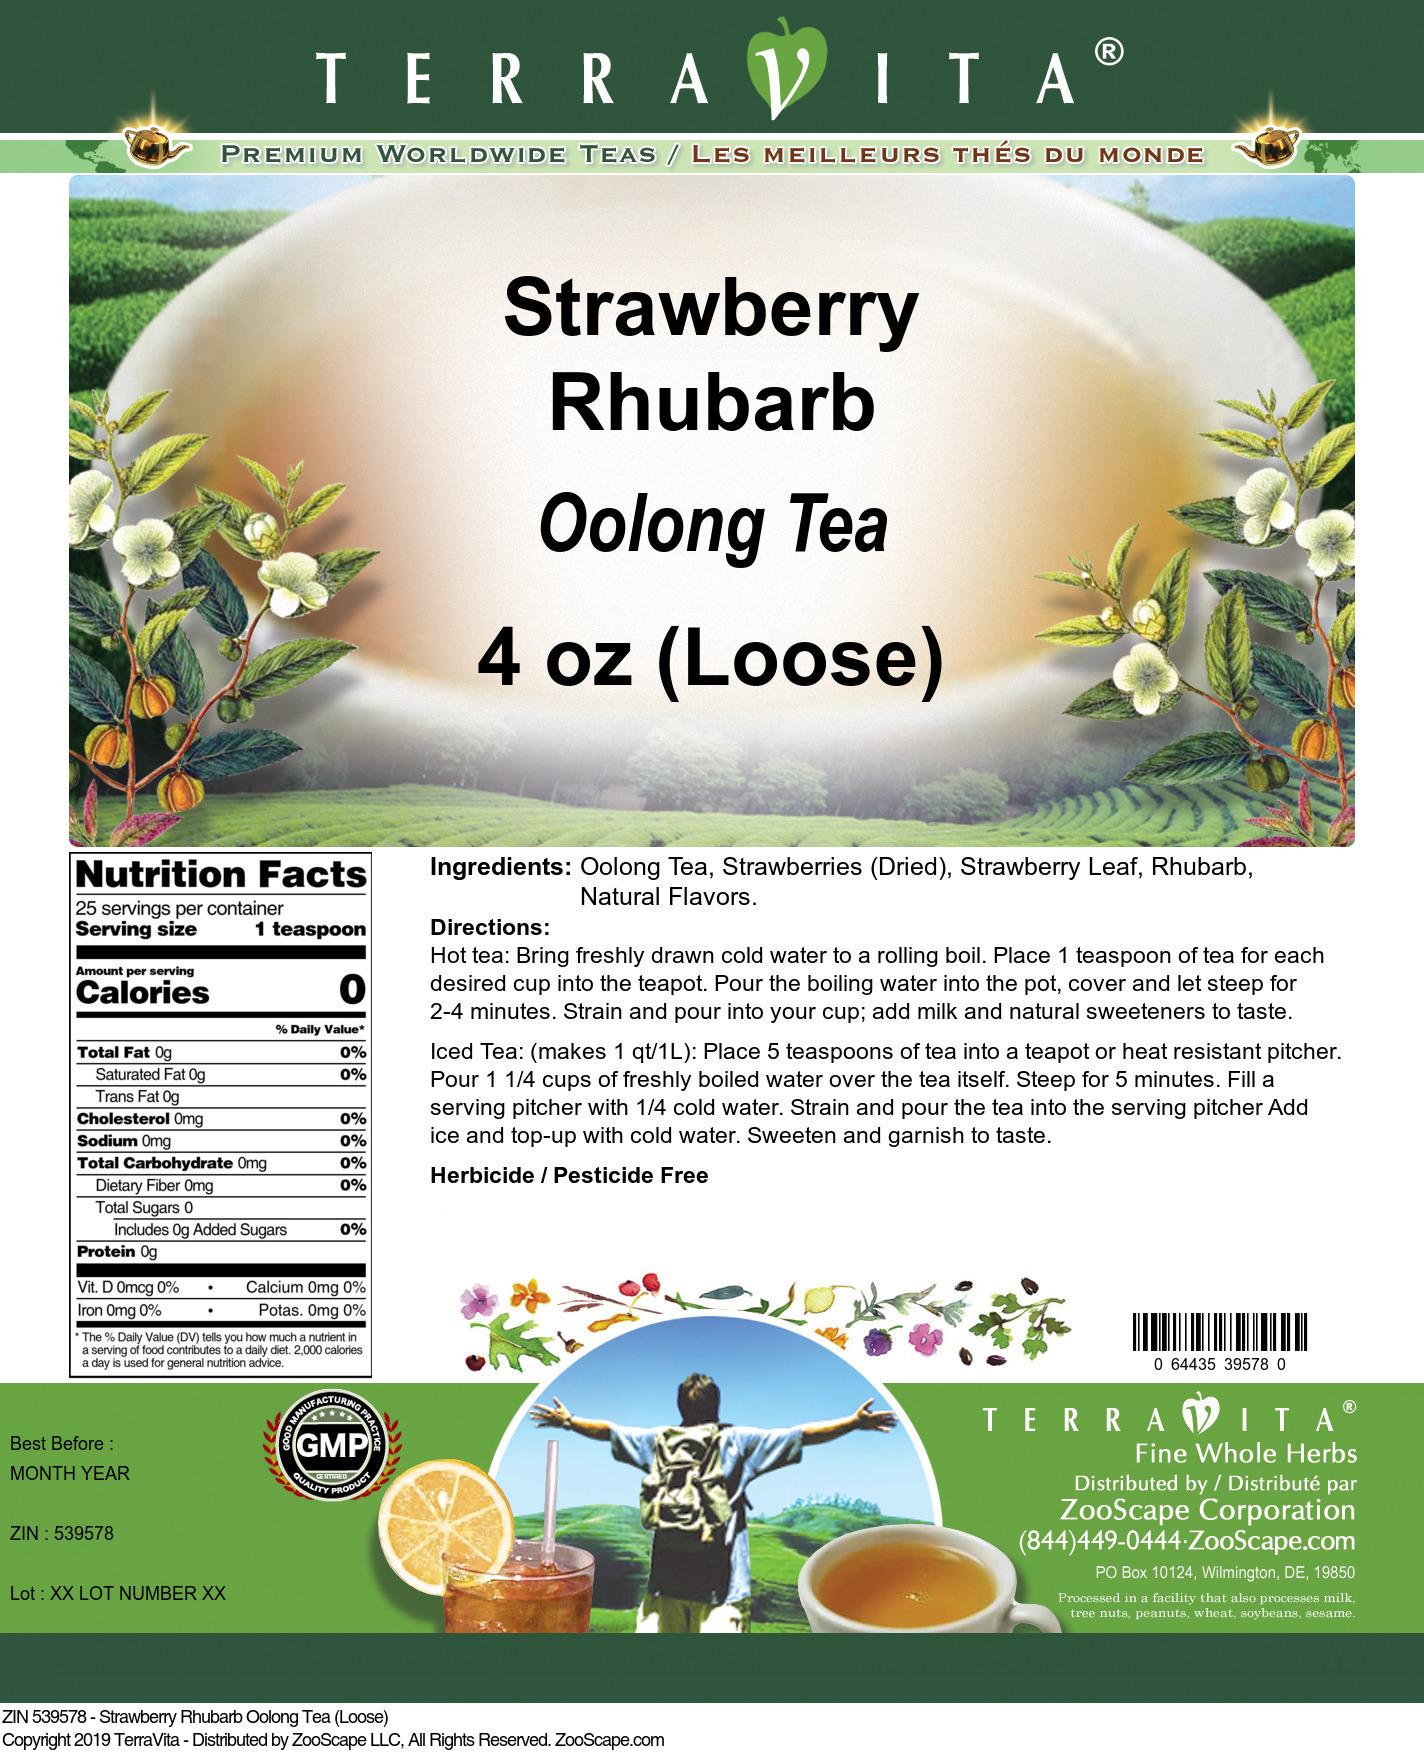 Strawberry Rhubarb Oolong Tea (Loose)